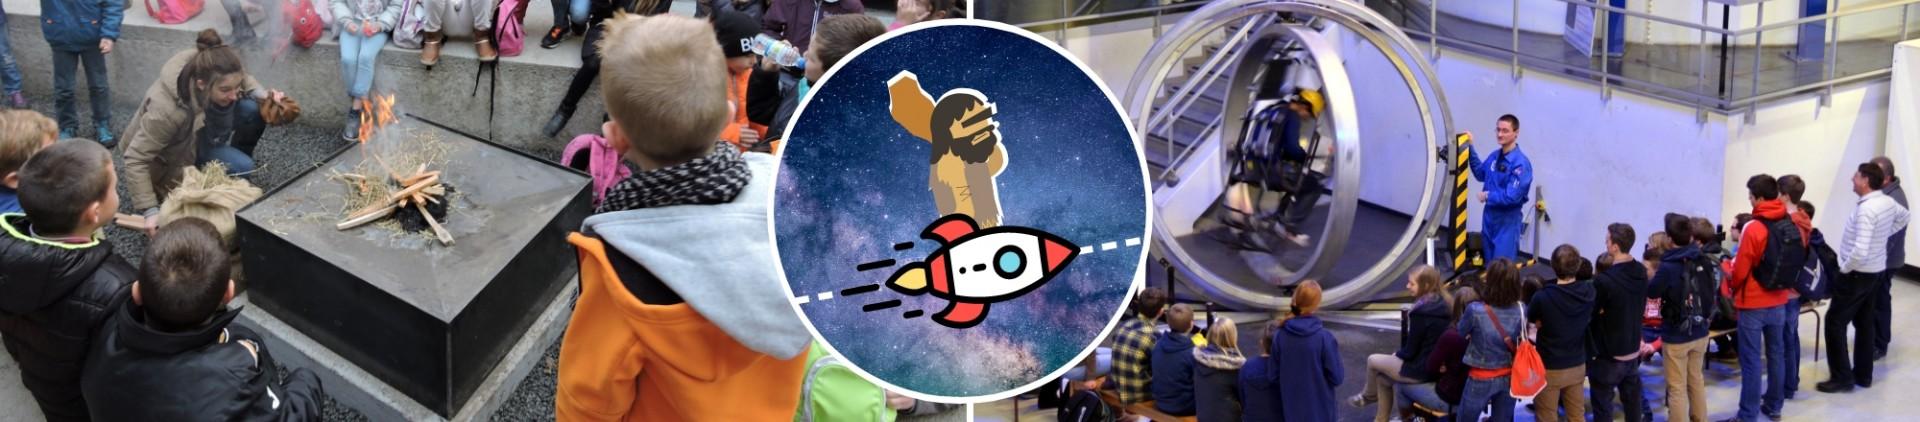 School groups - From the Flintstones to the Moon